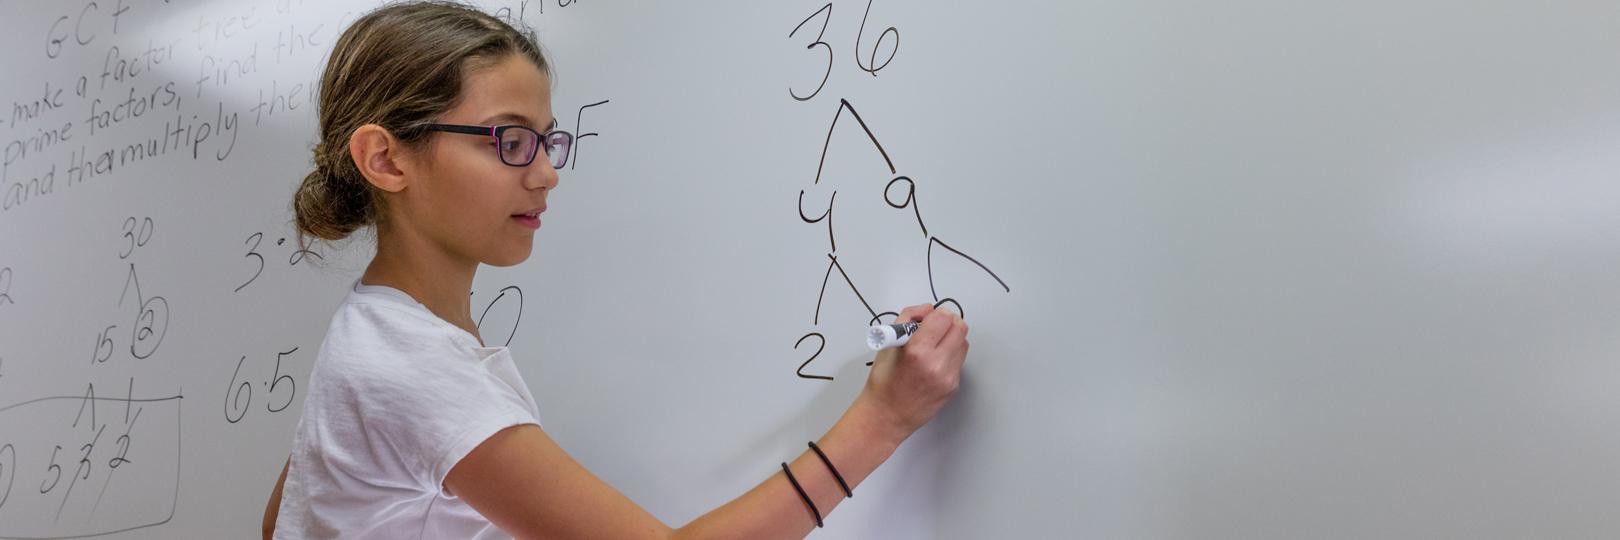 "<span class=""slider_title"">                                     Learn                                </span>"